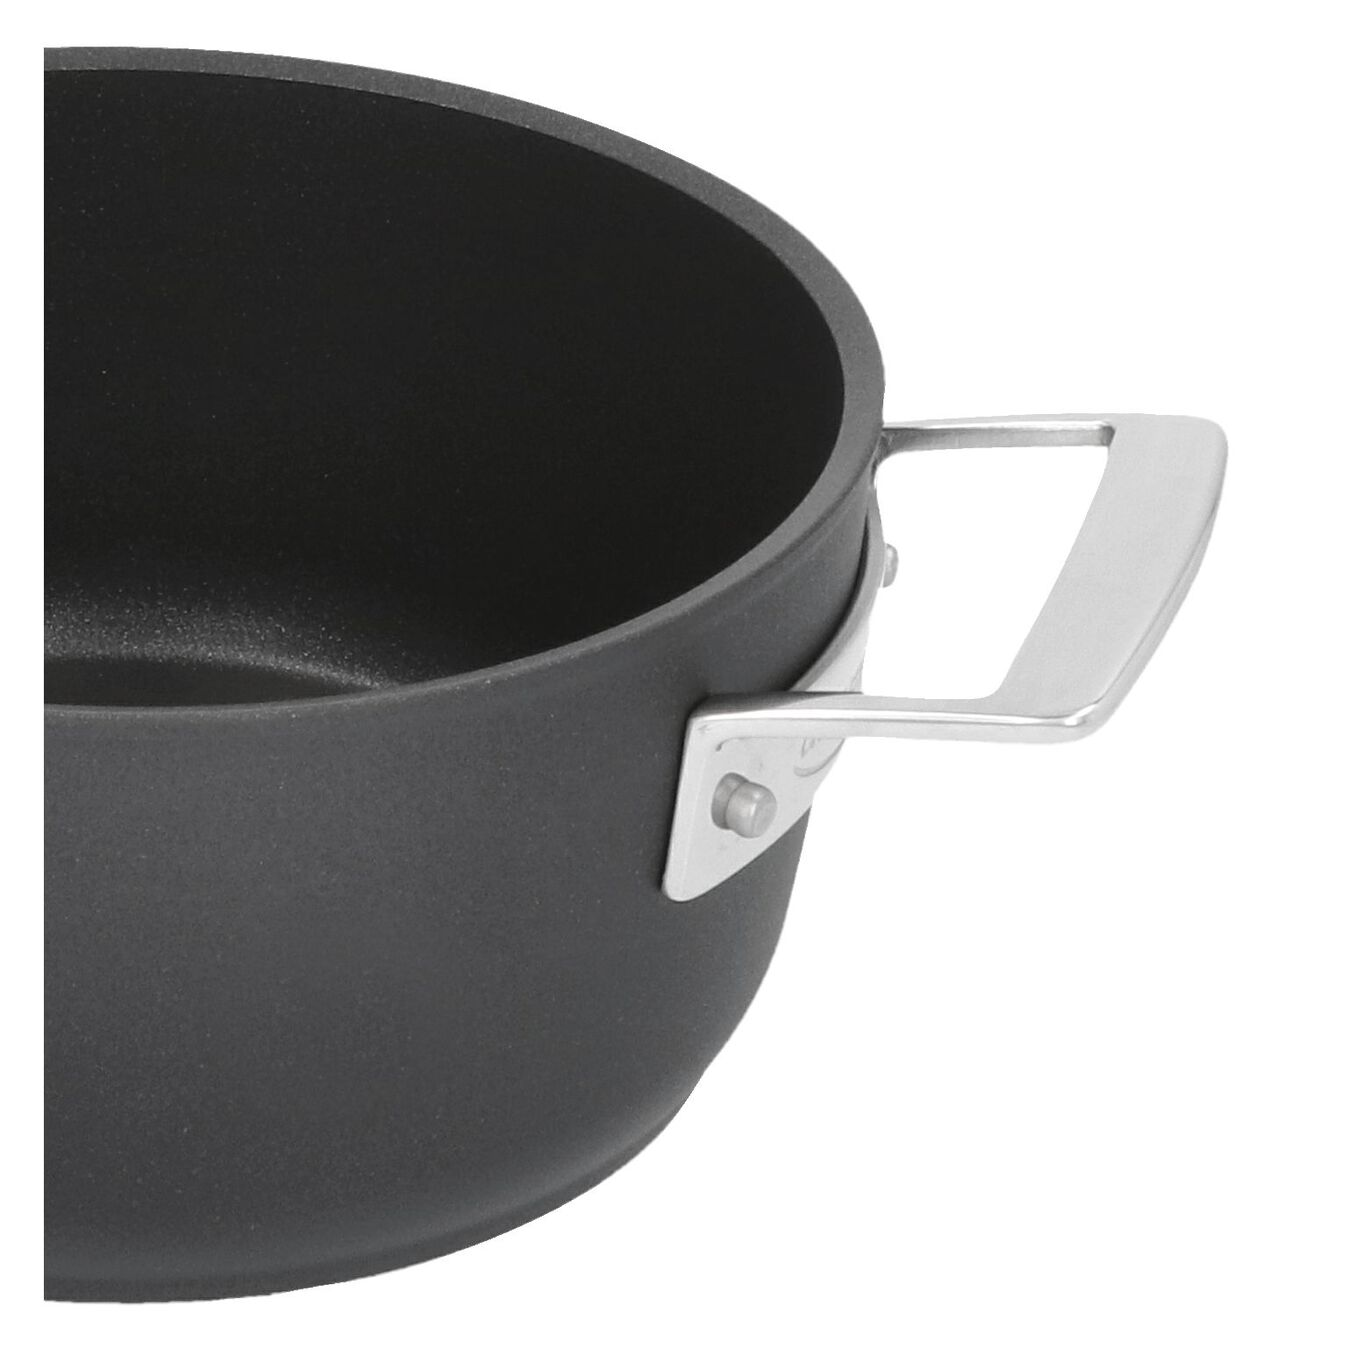 Kookpot met deksel Duraslide Titanium 18 cm / 2 l,,large 3